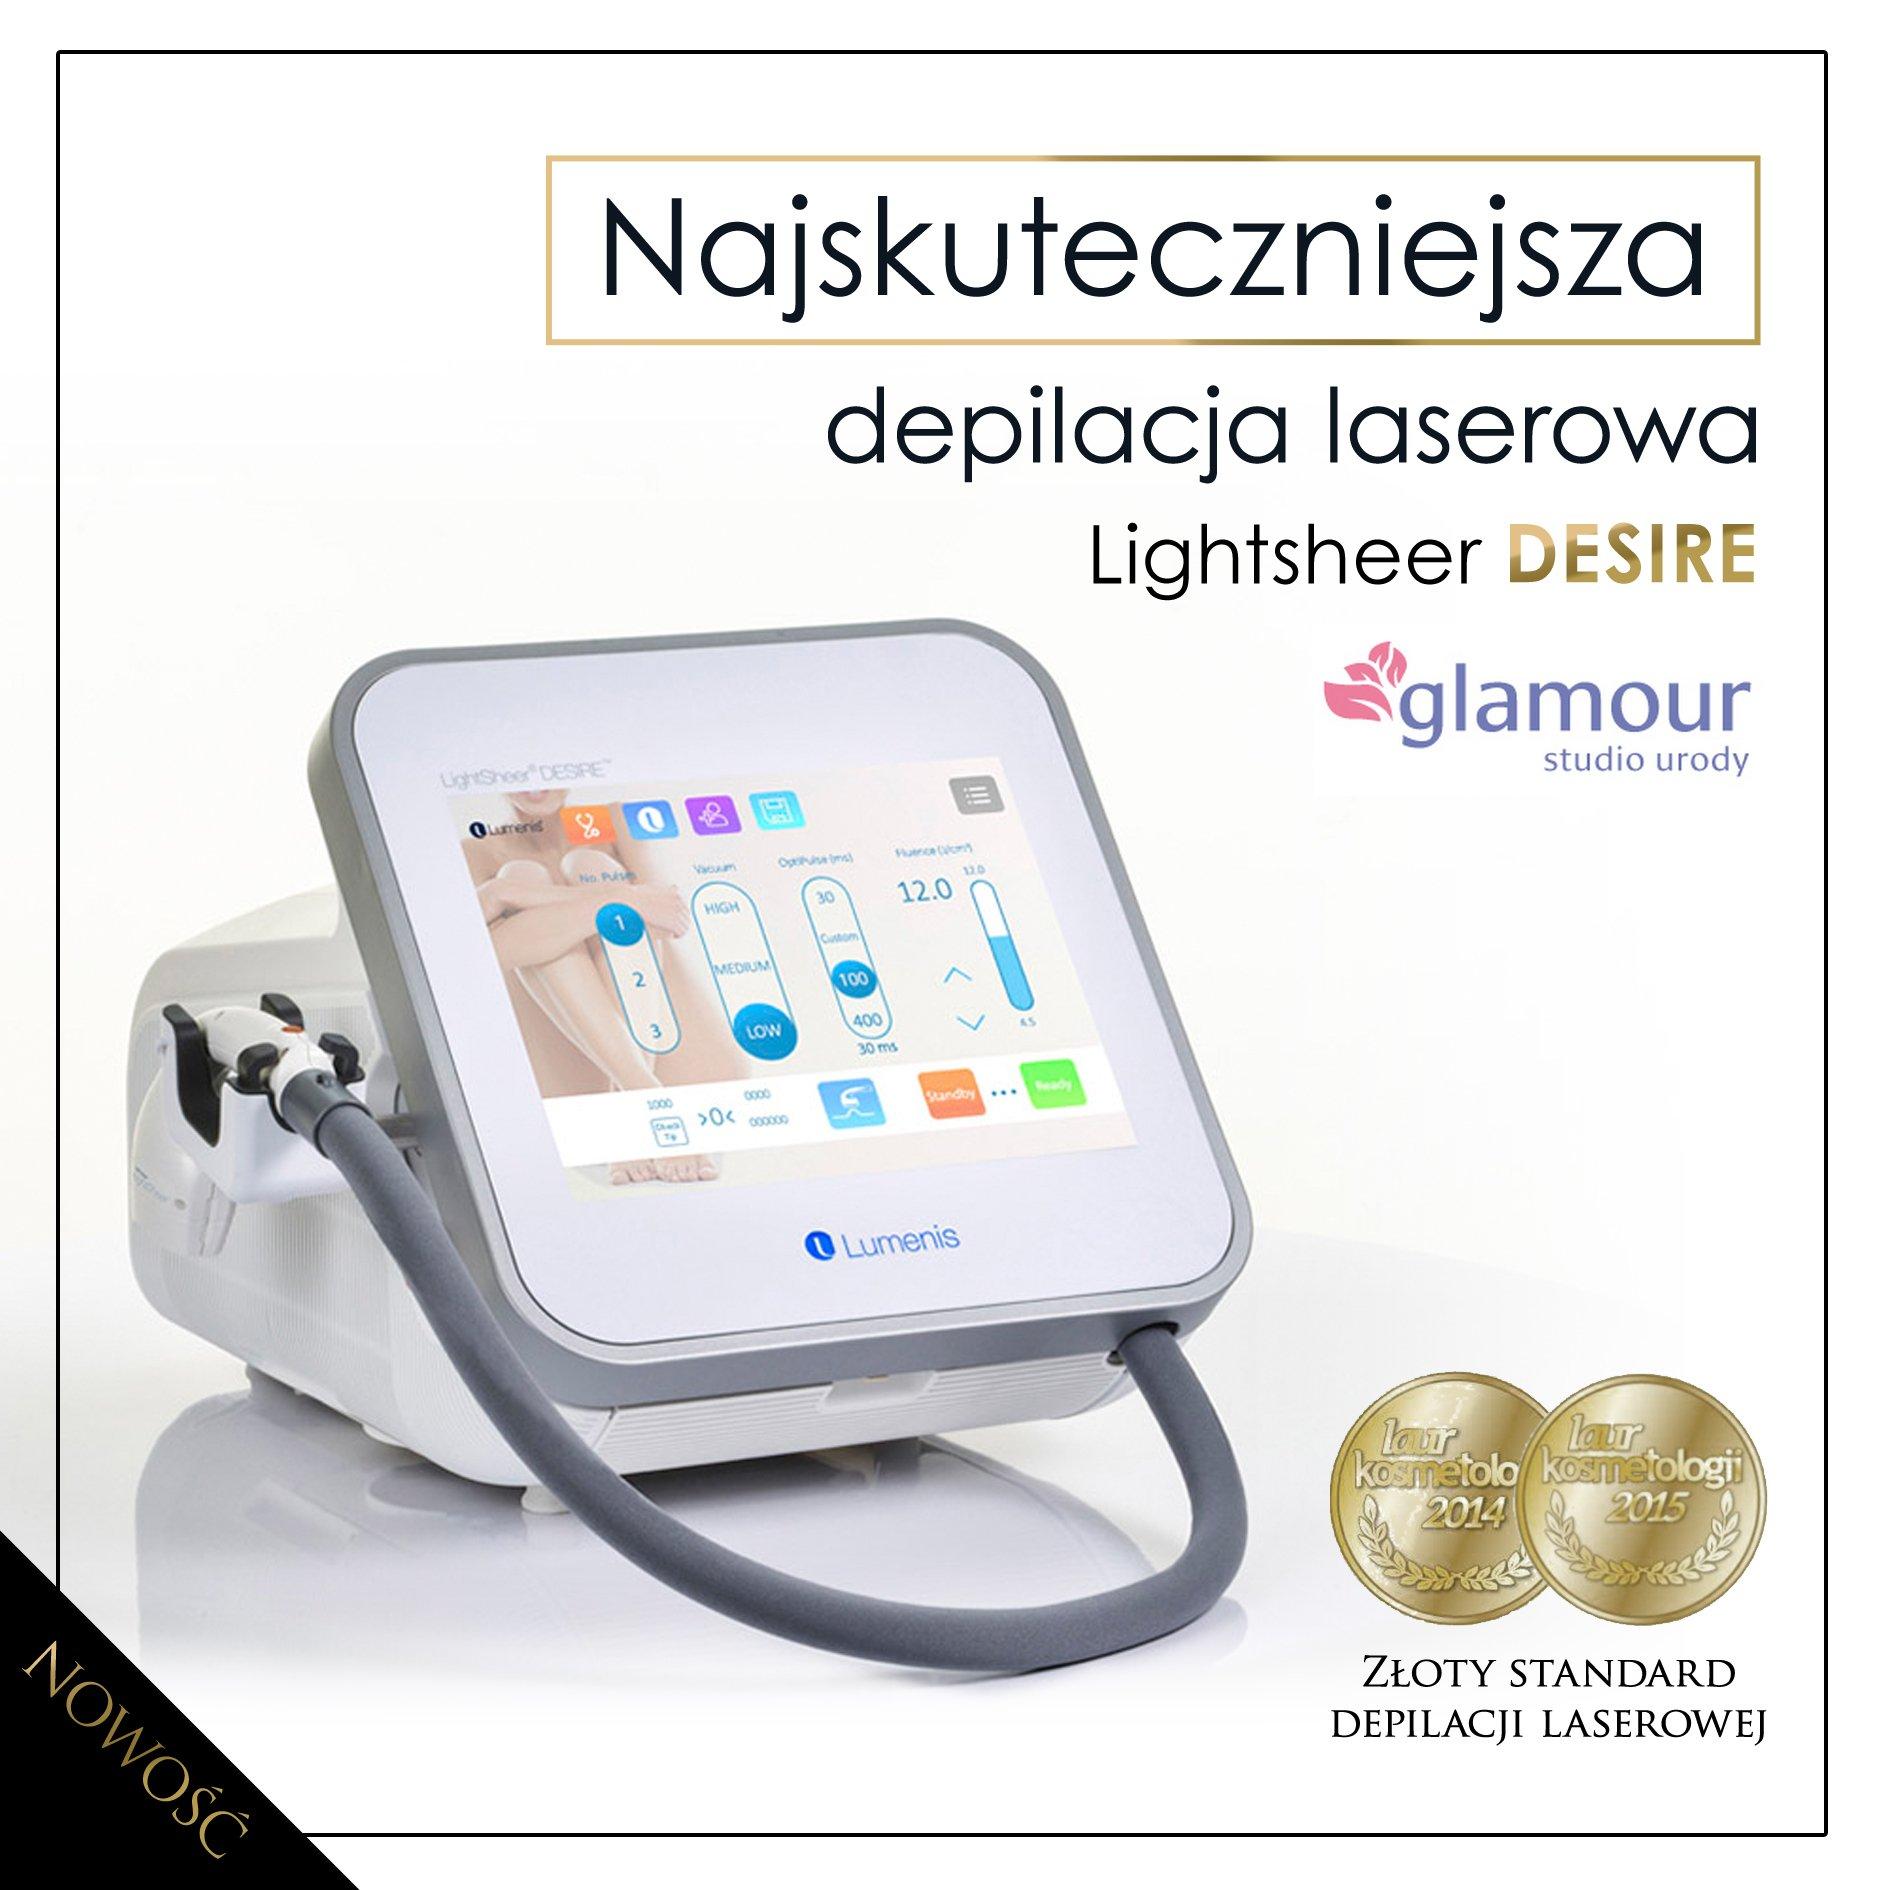 Niewiarygodnie Laser diodowy Light Sheer Desire Light NOWY ! - 7047844070 MF12